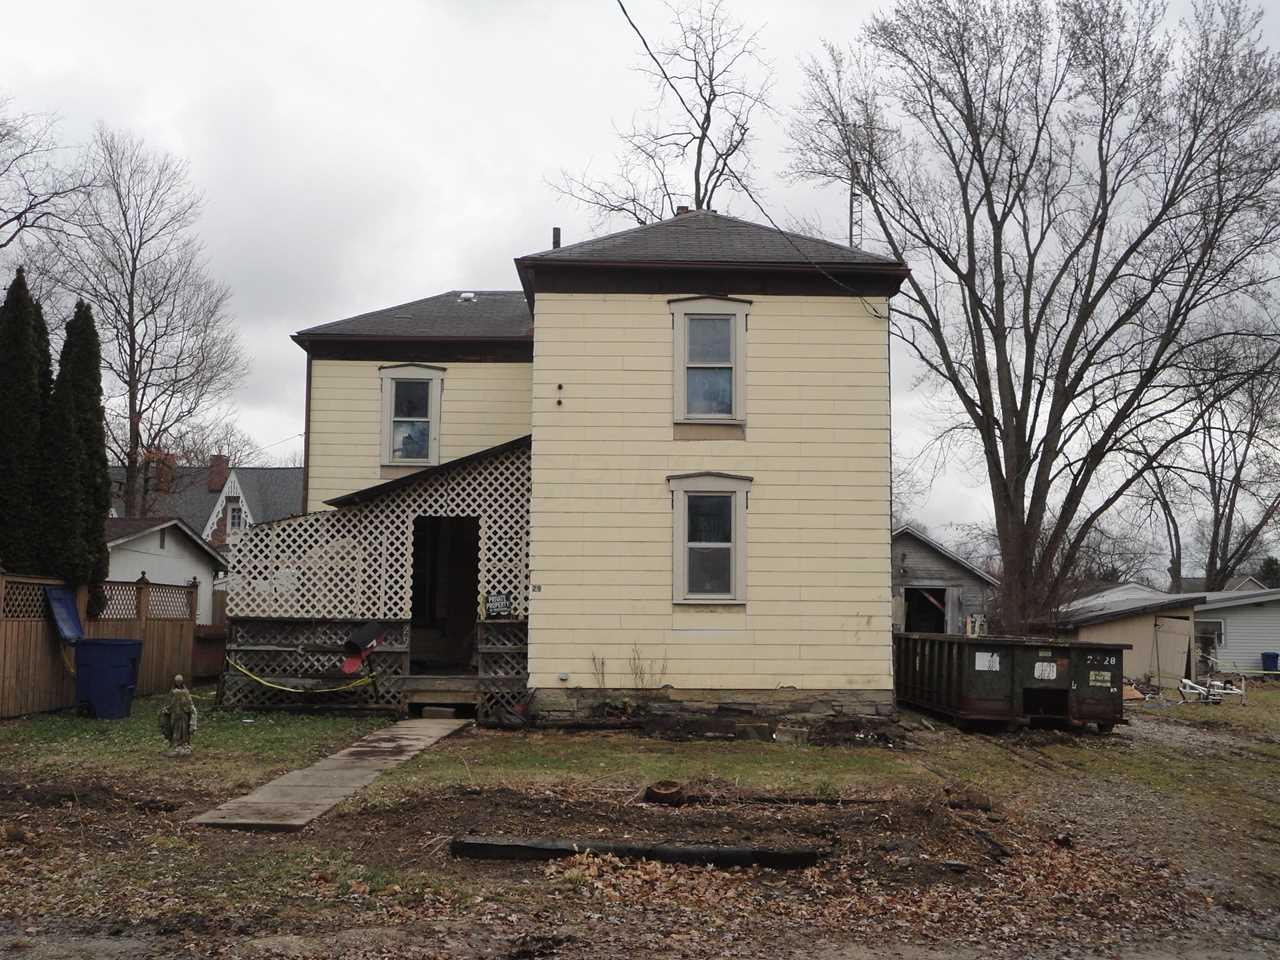 29 Kurrley Street Delaware, OH 43015 | MLS 218043869 Photo 1